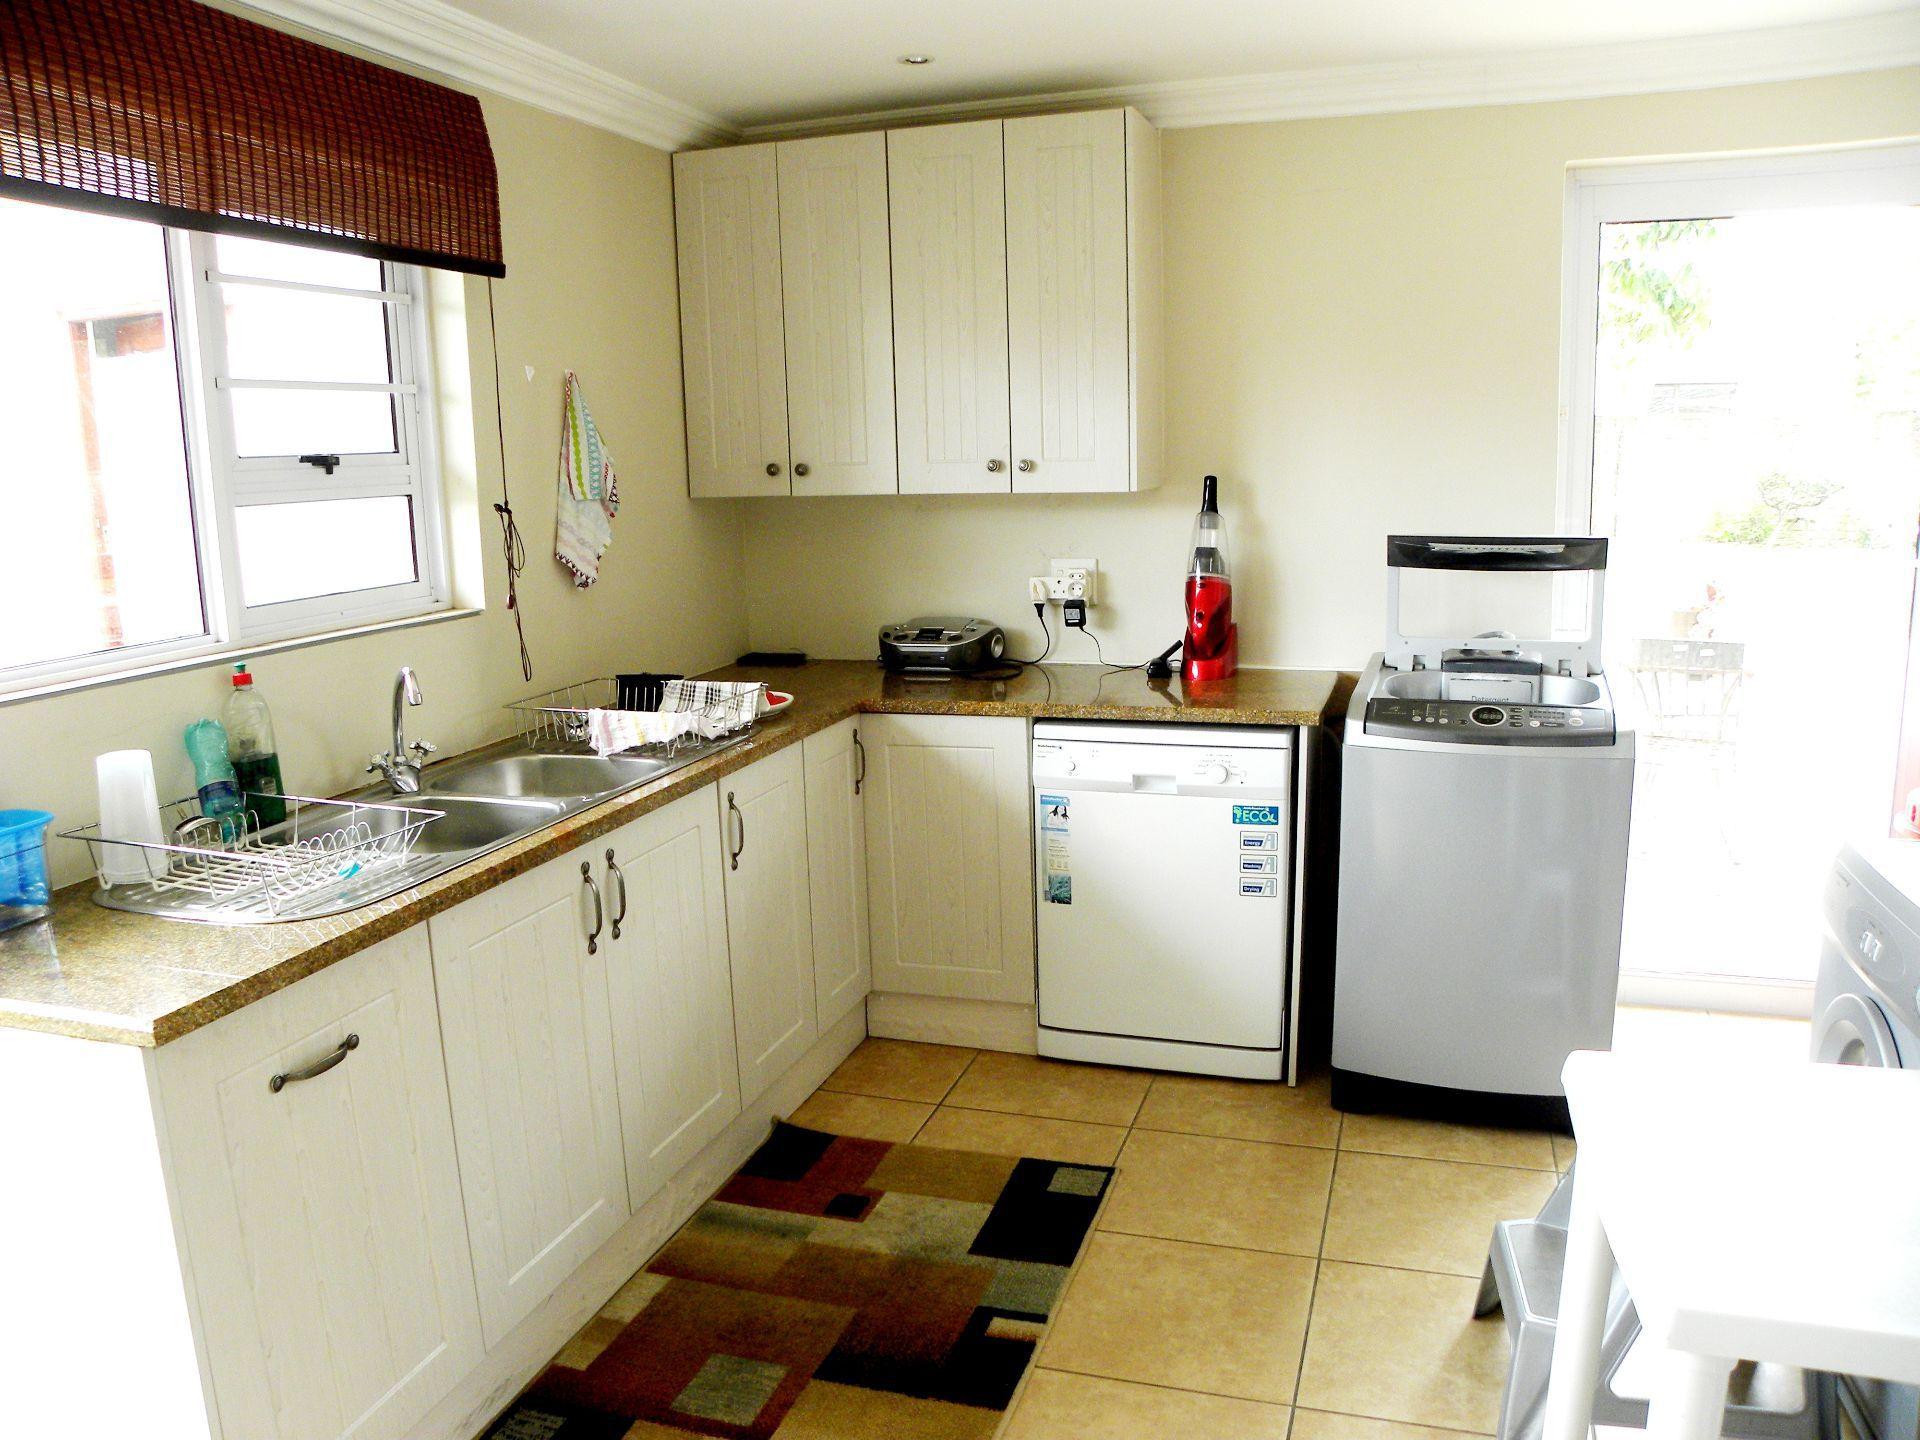 Bonnie Doone property for sale. Ref No: 13553551. Picture no 9